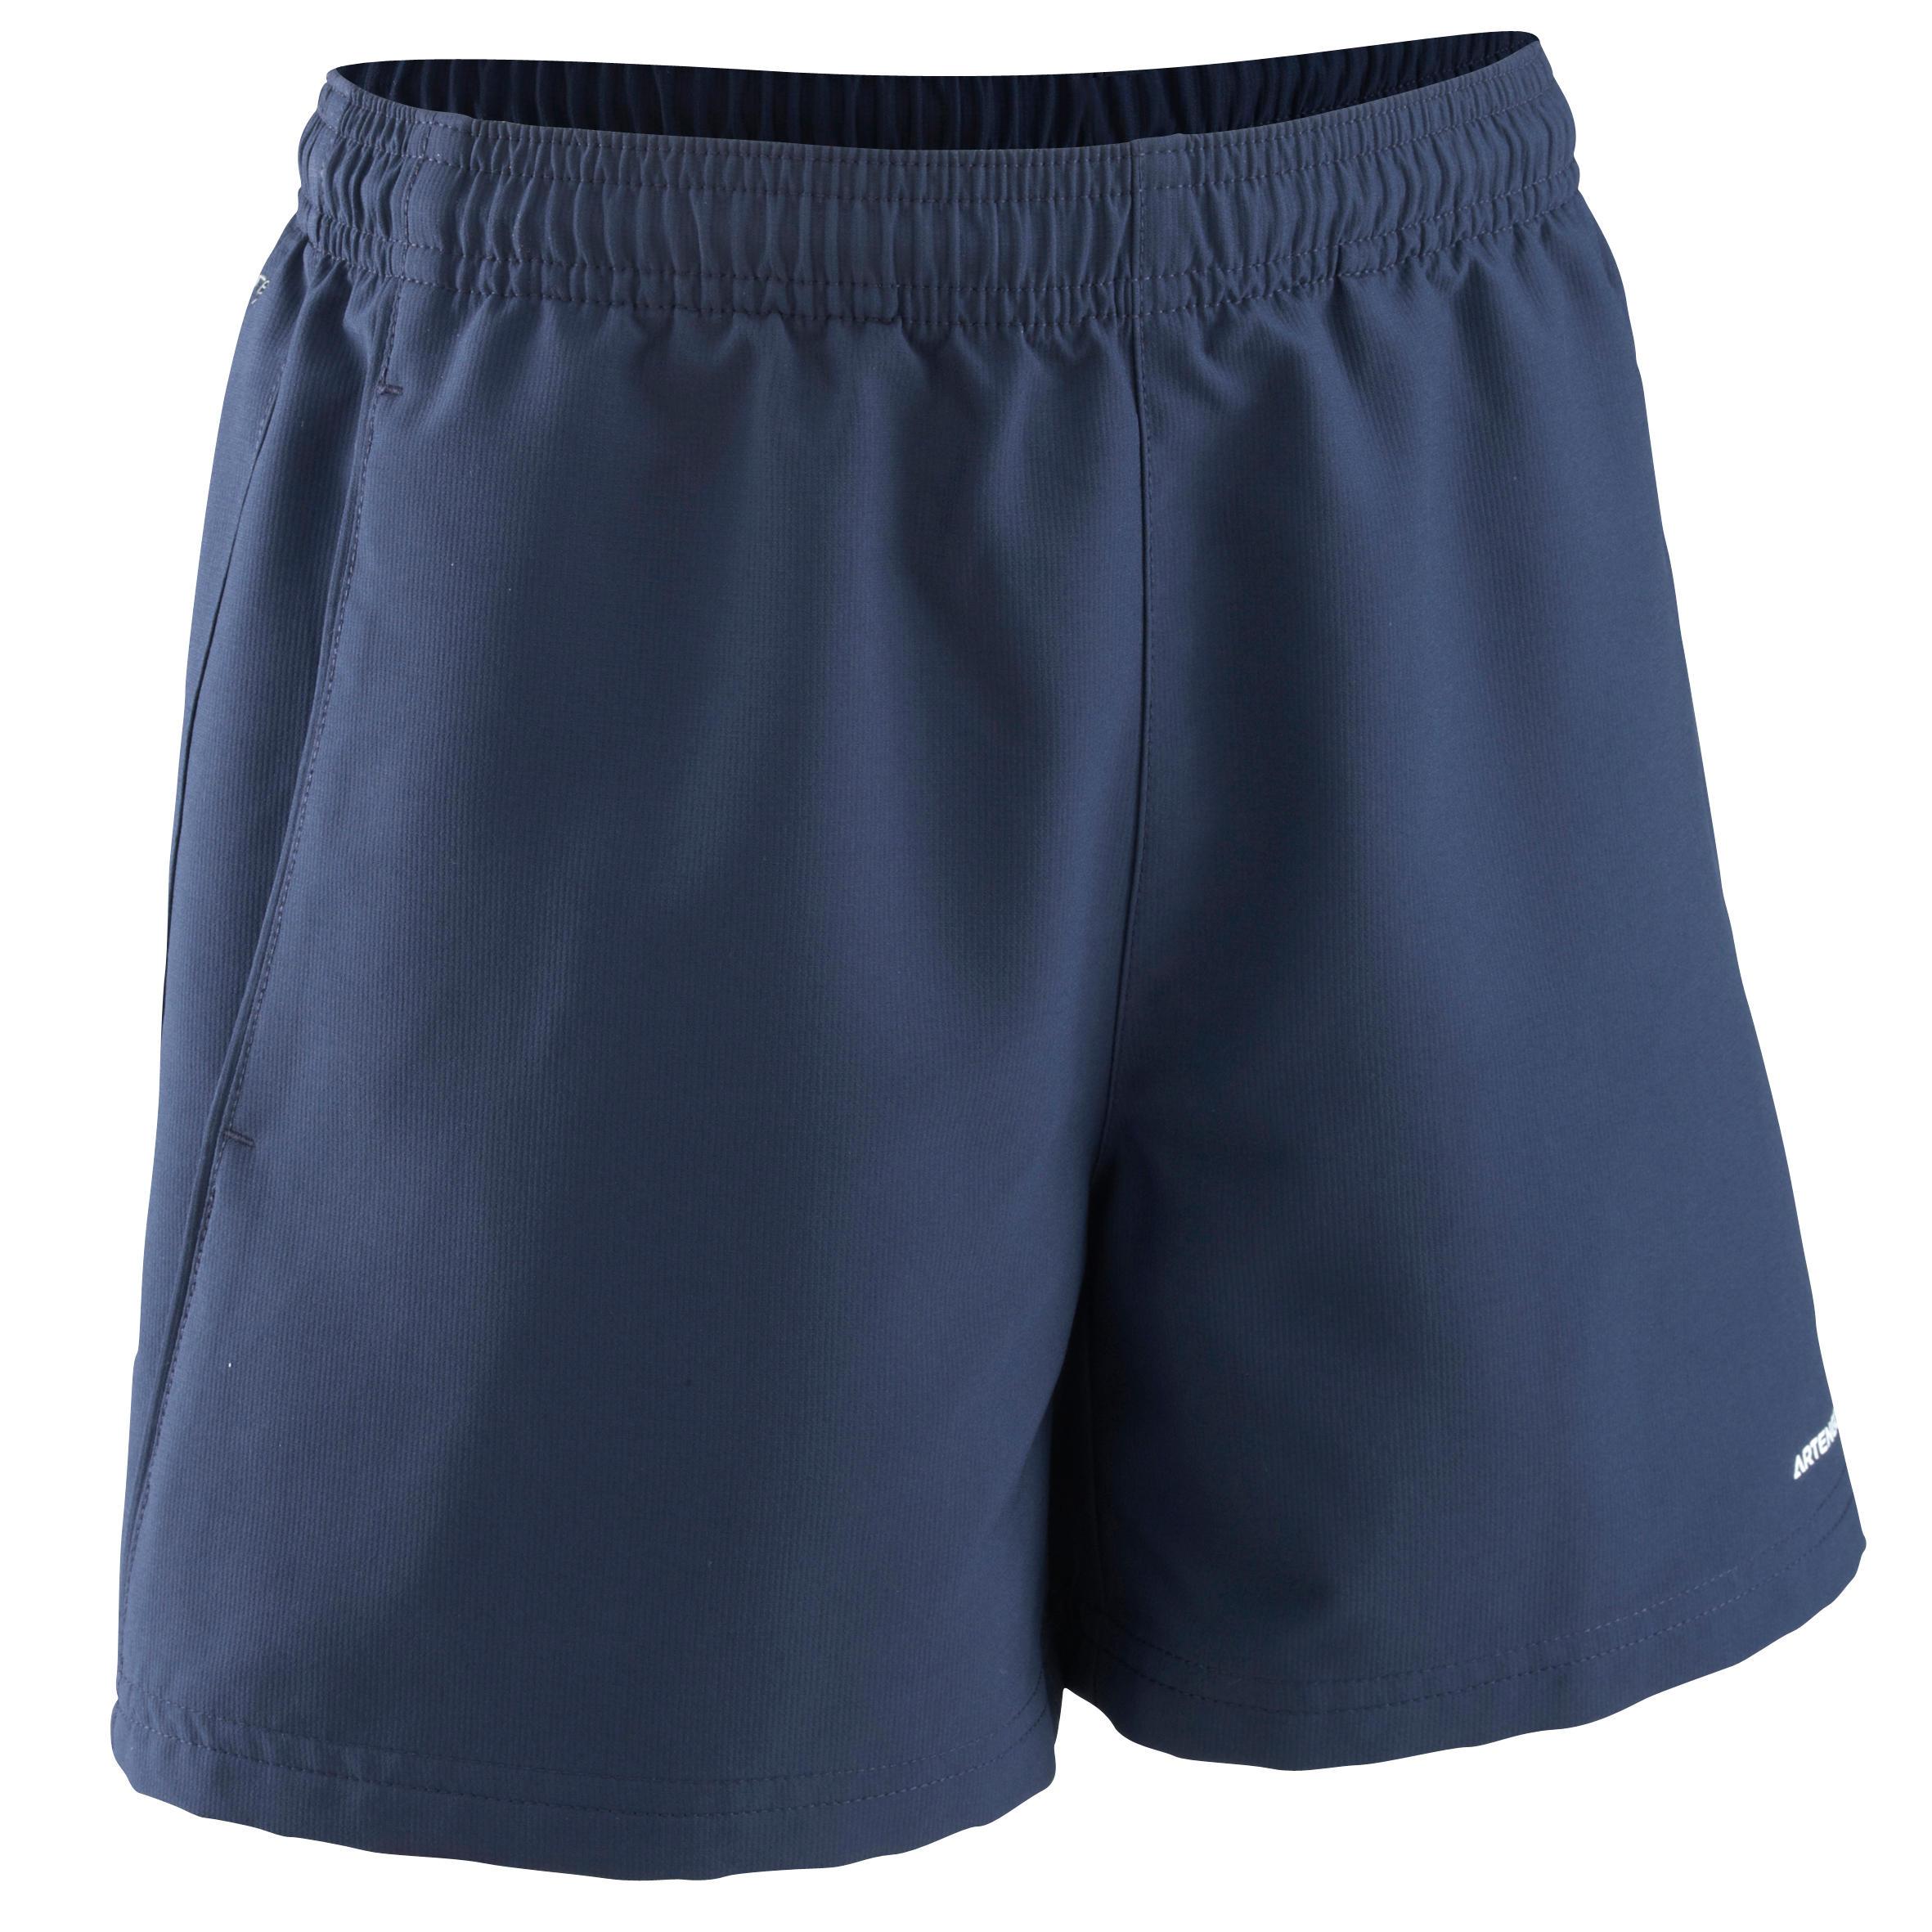 Essential Junior Shorts - Navy Blue